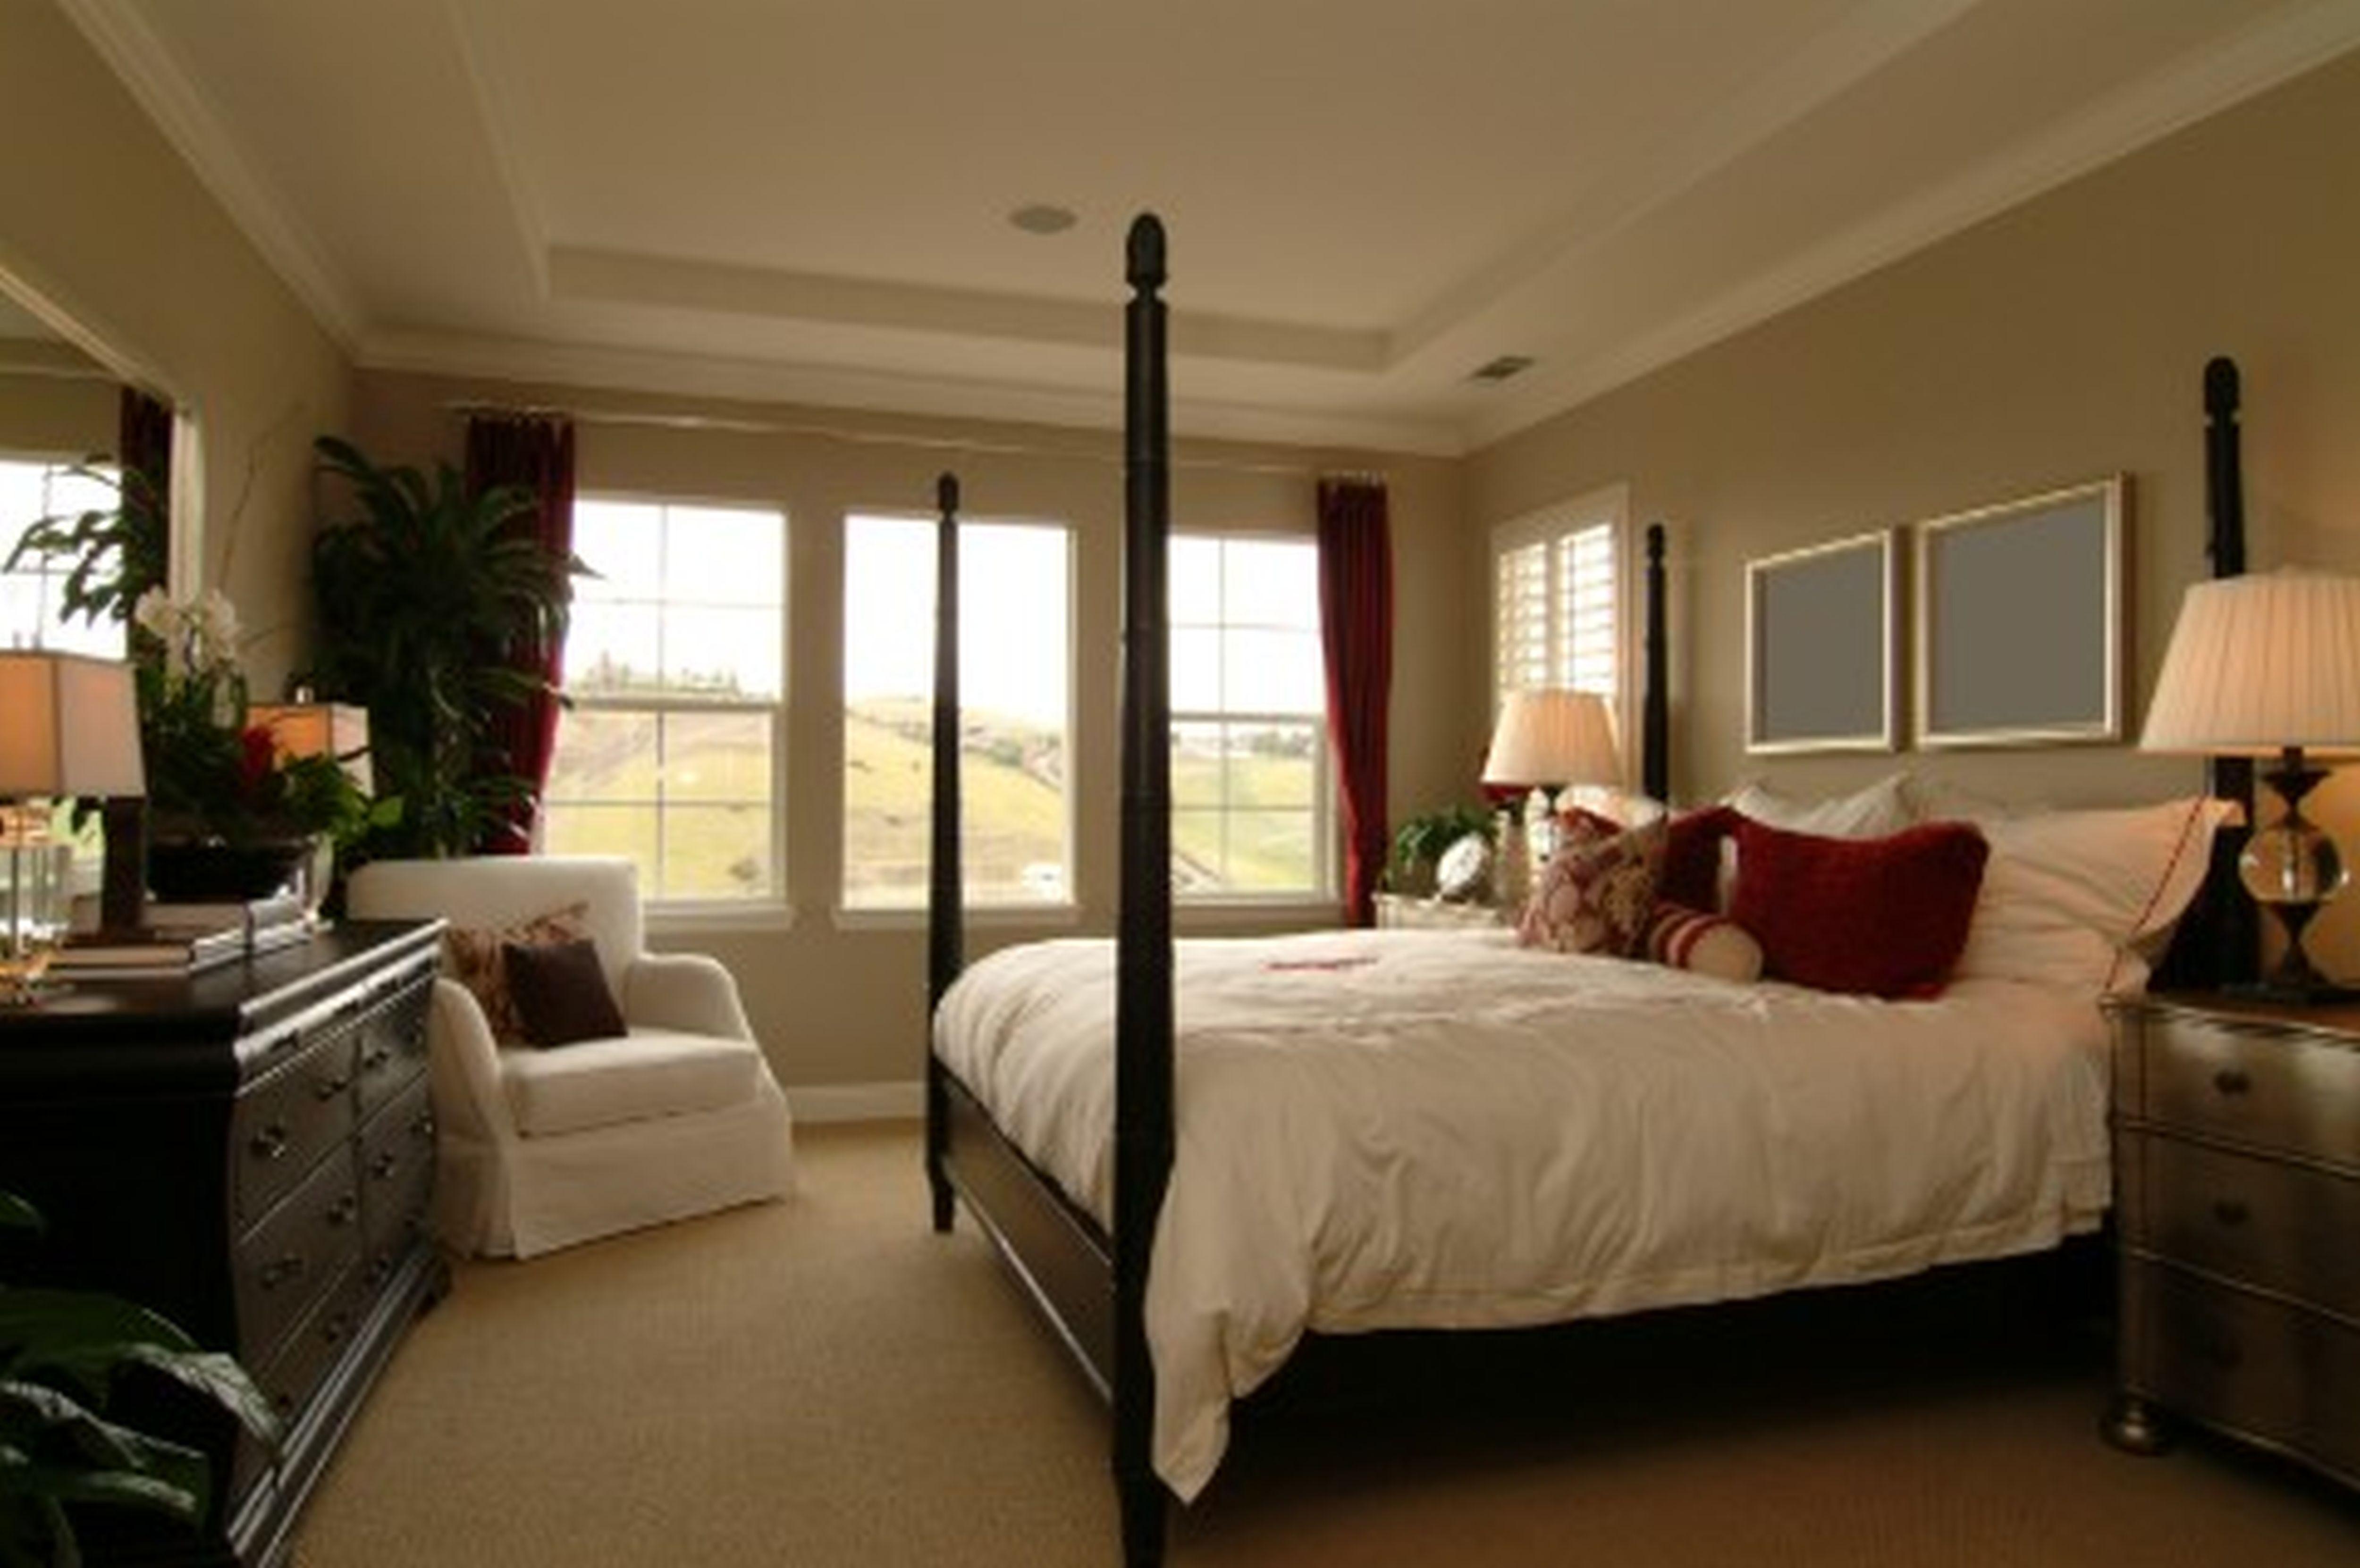 Interior Design Bedroom Ideas On A Budget on Cheap Bedroom Ideas  id=21277